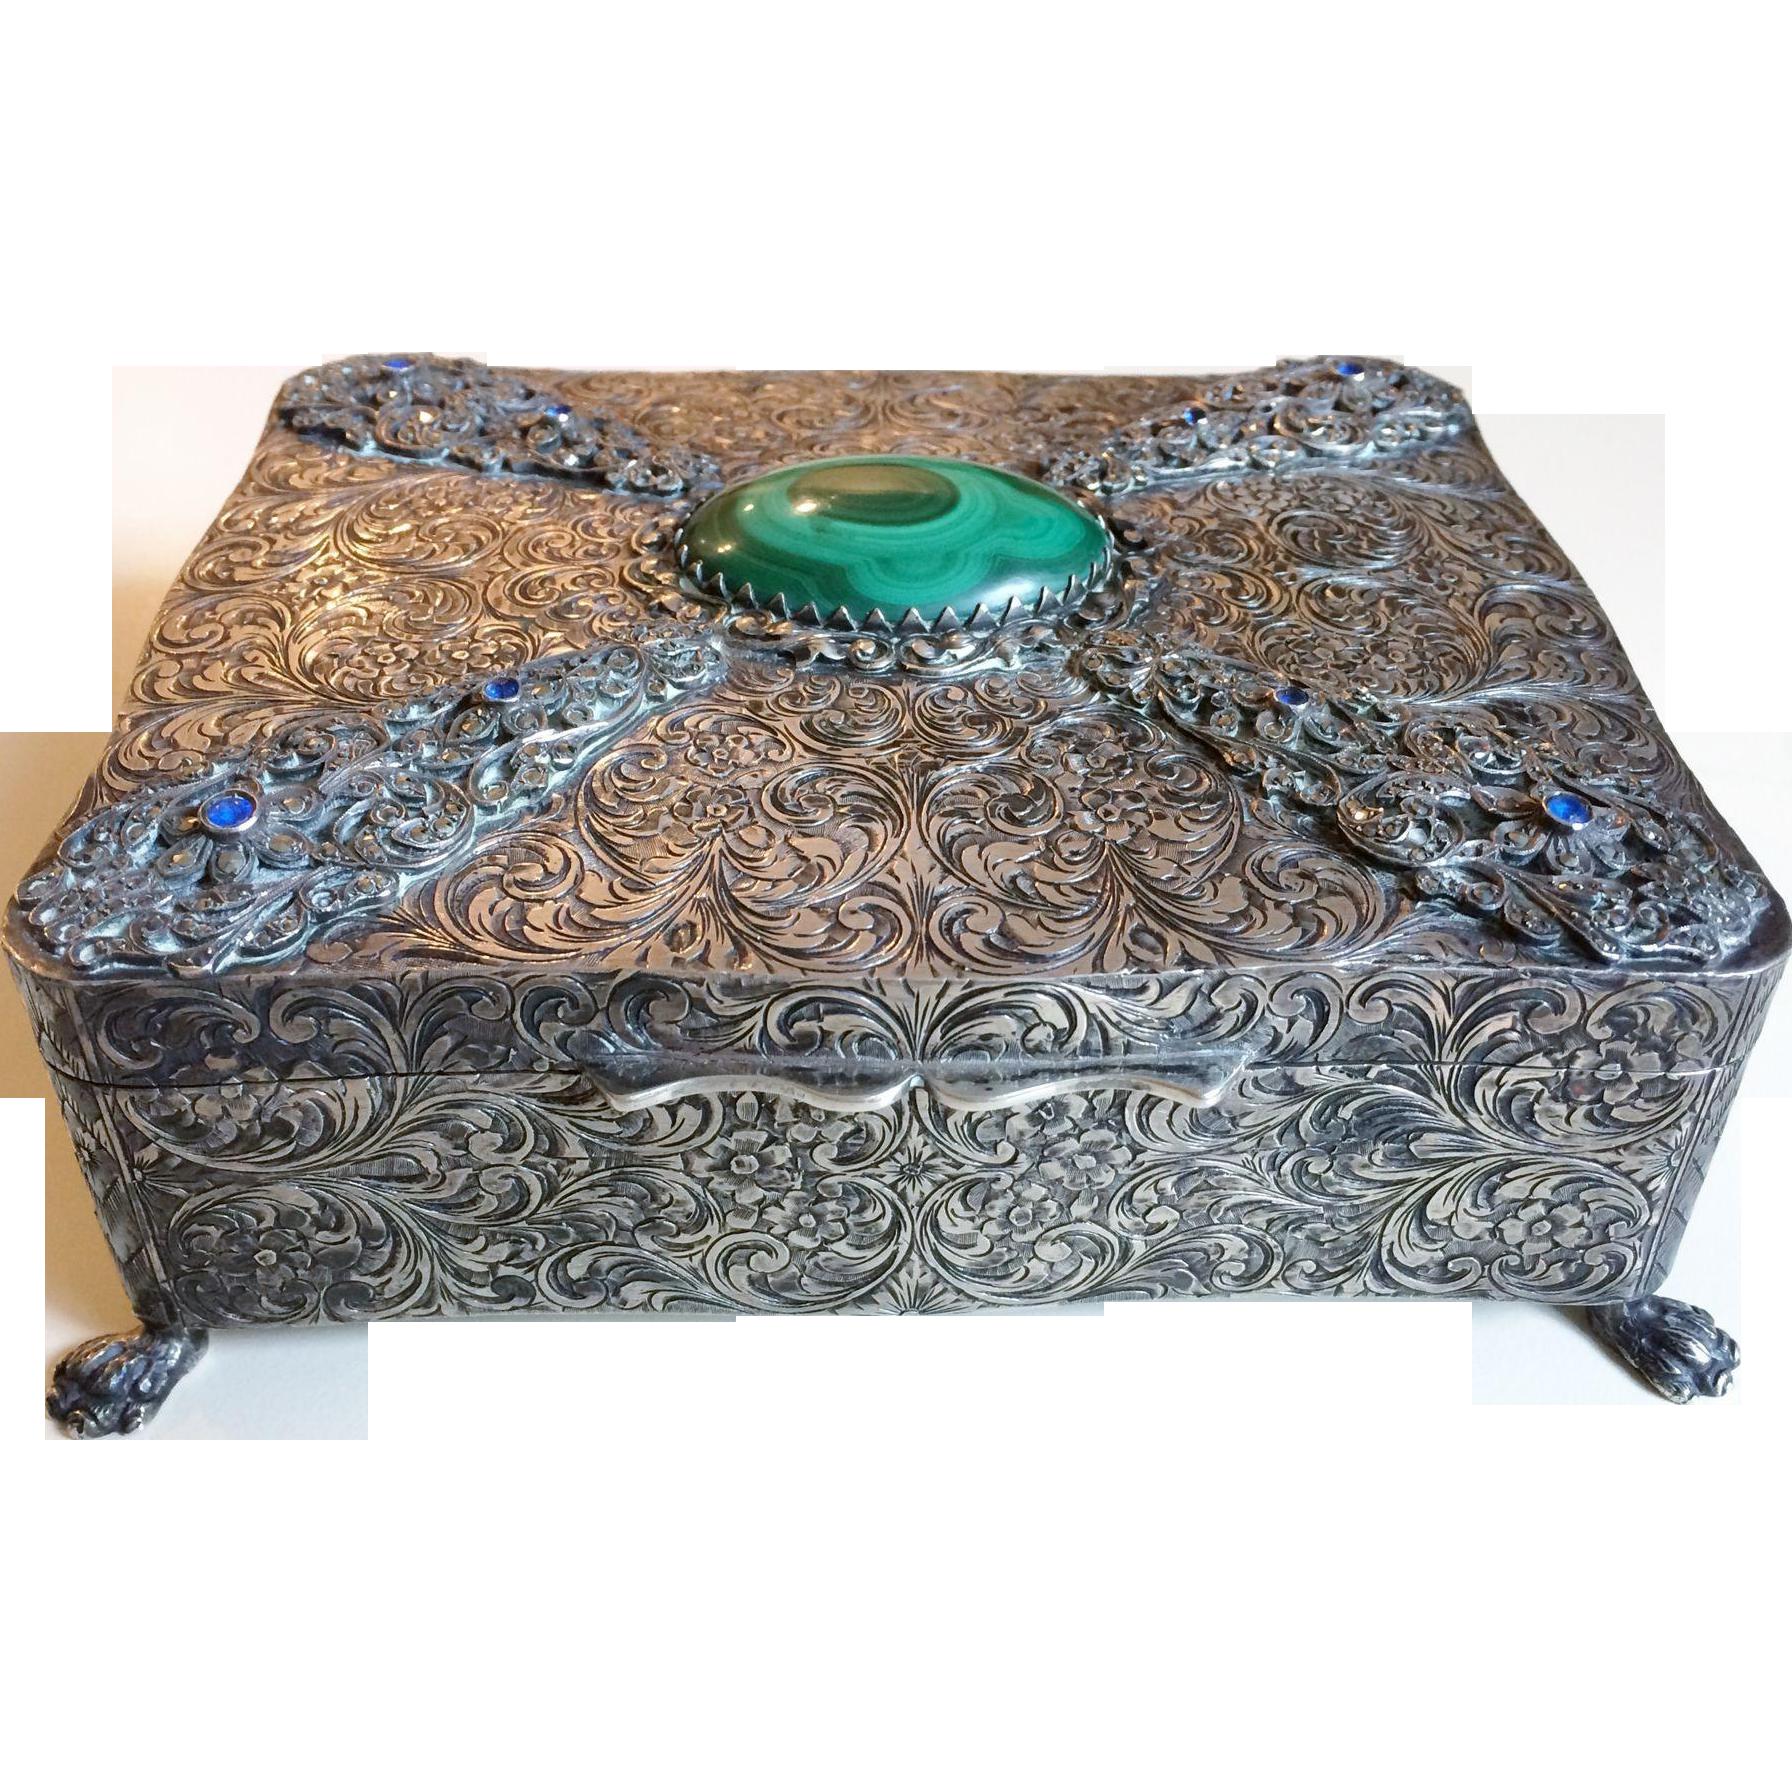 Gorgeous Sterling Silver Box Ugo Bellini, Italy circa 1940's, 515 grams!